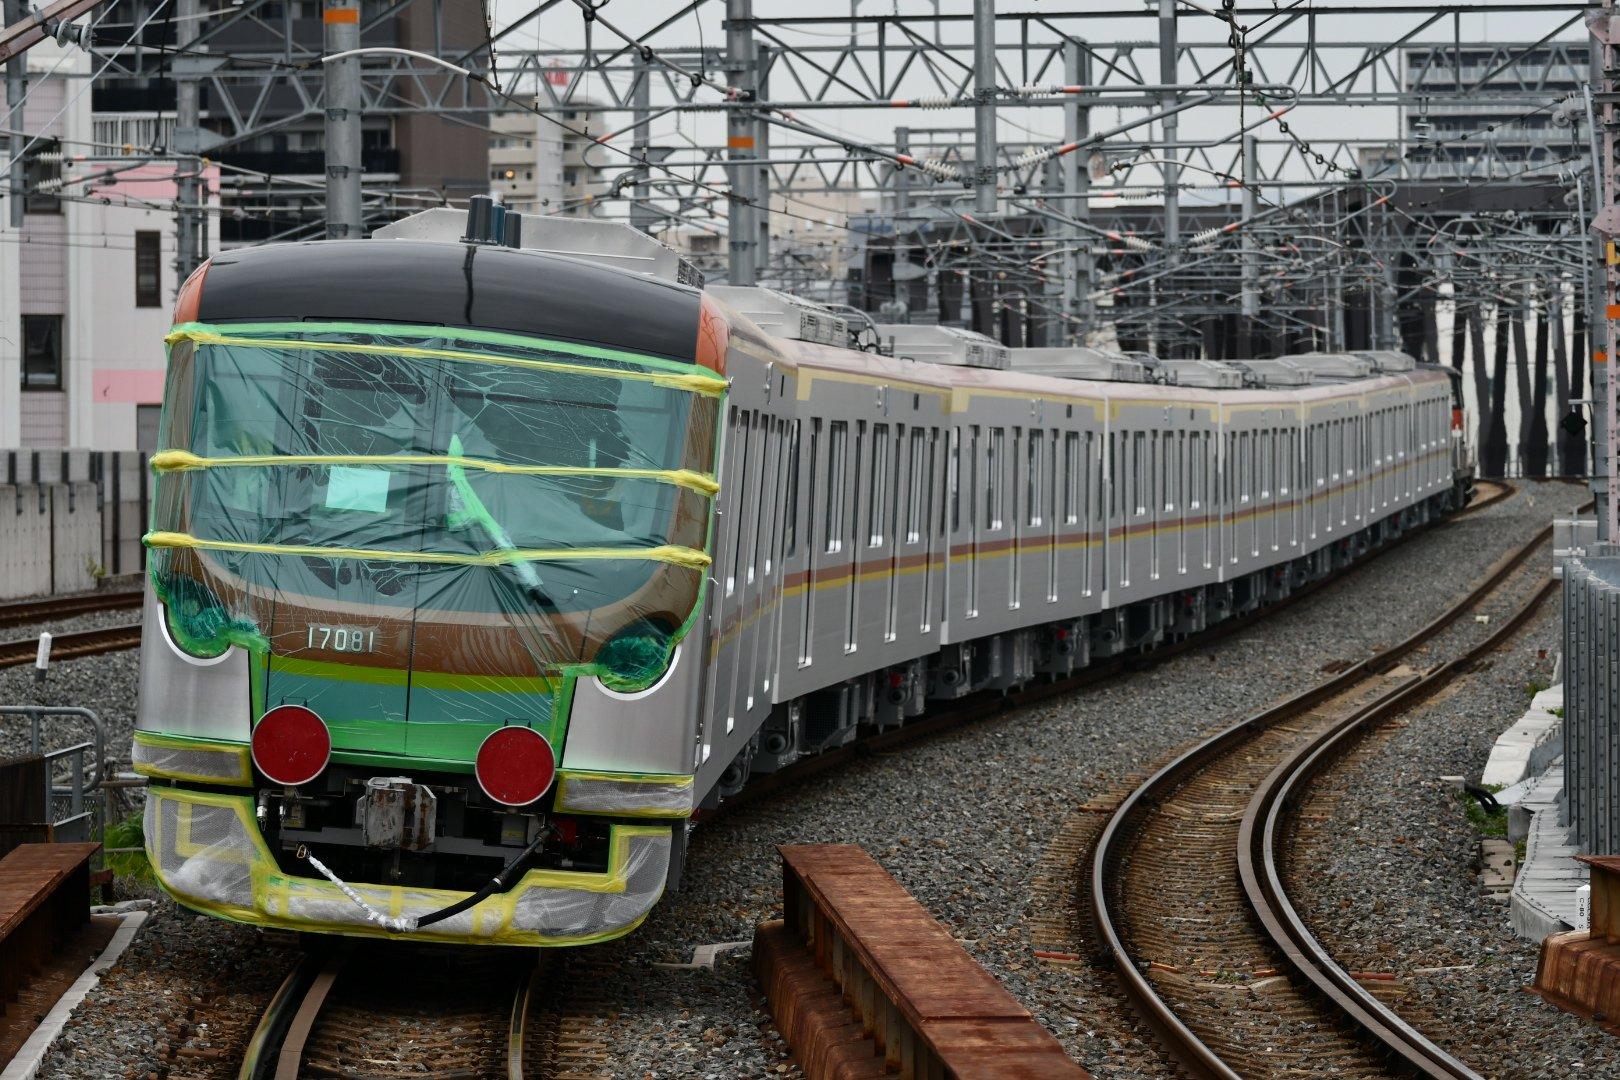 【VVVFが初の日立製に】東京メトロ17000系に8両編成が登場 近畿車輛製80番台として仕様変更が